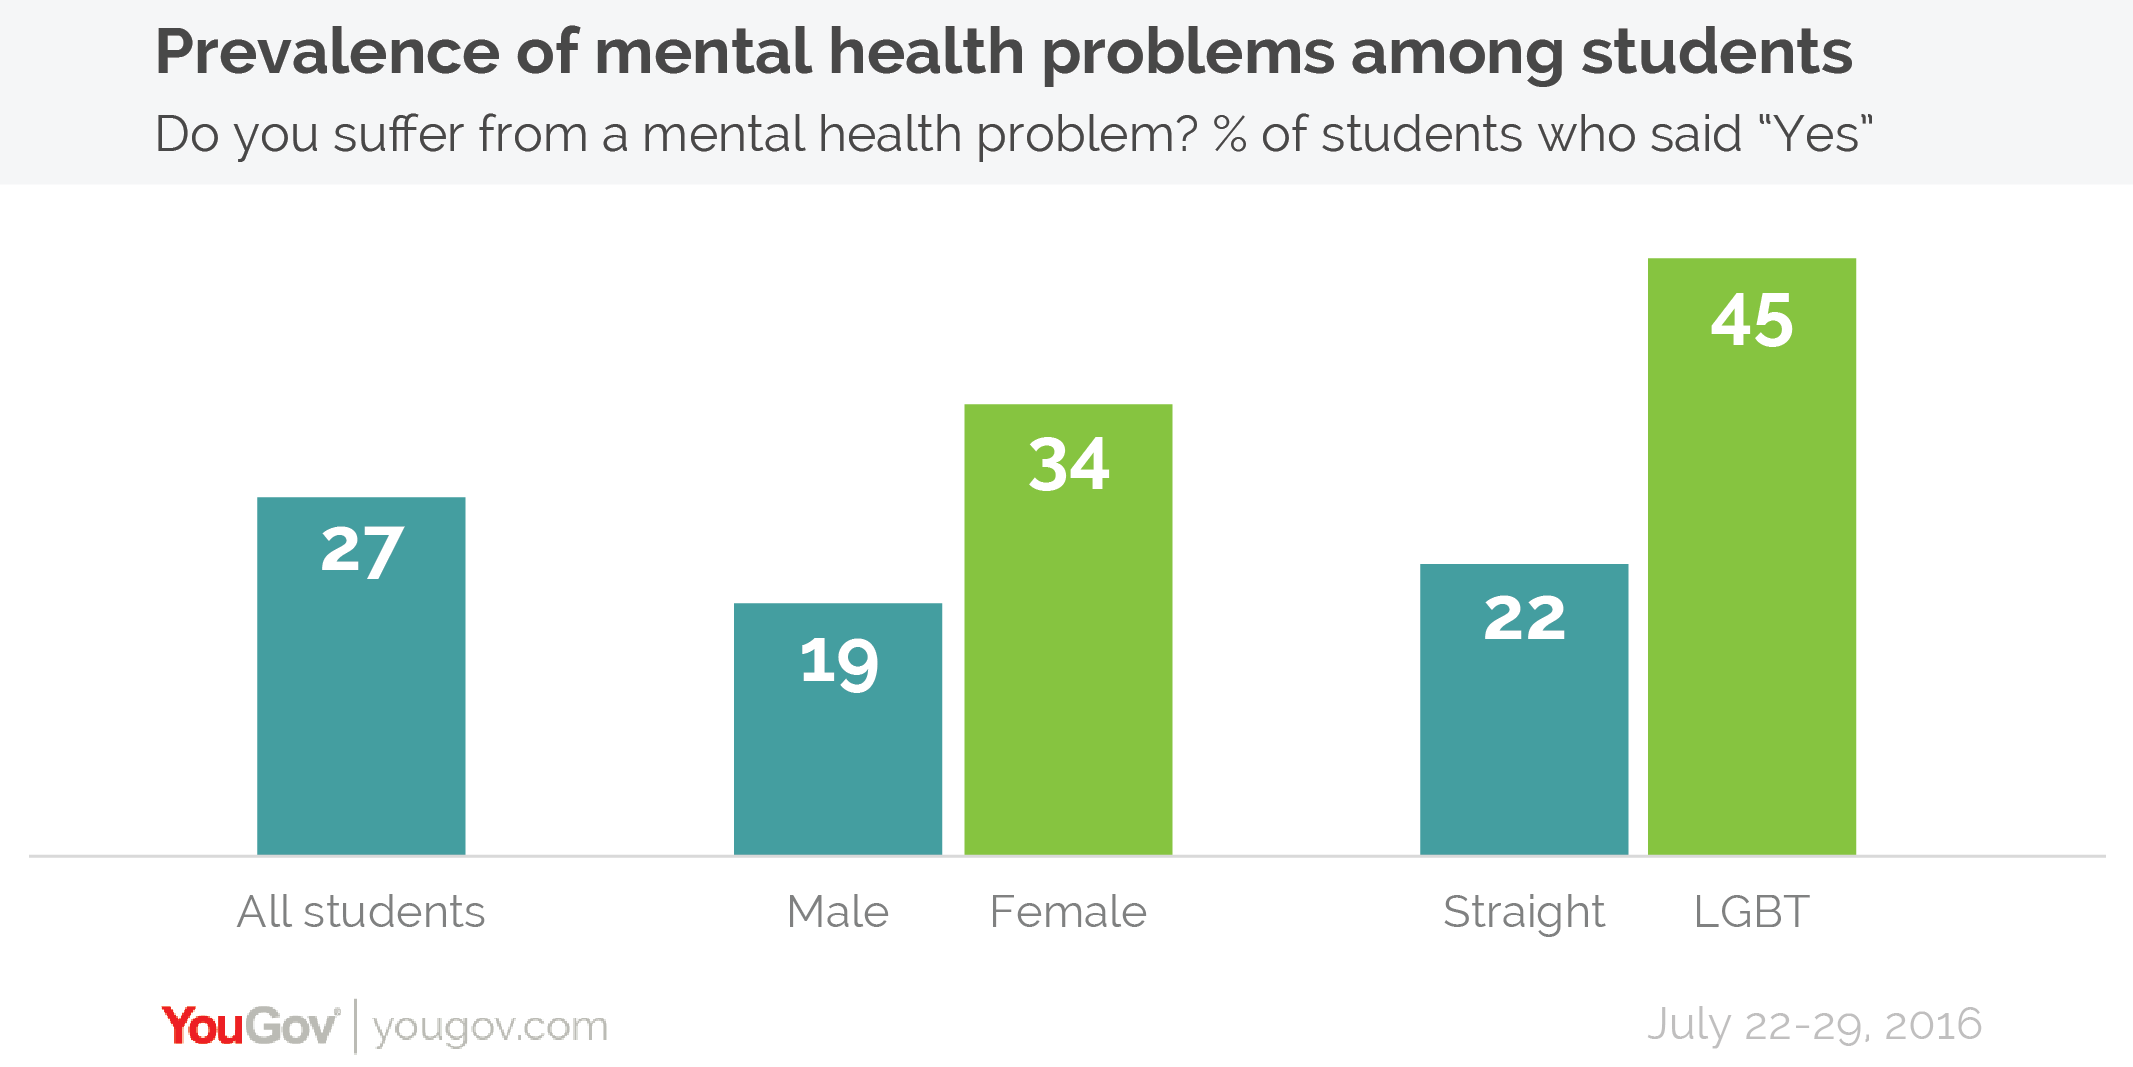 Student's mental health